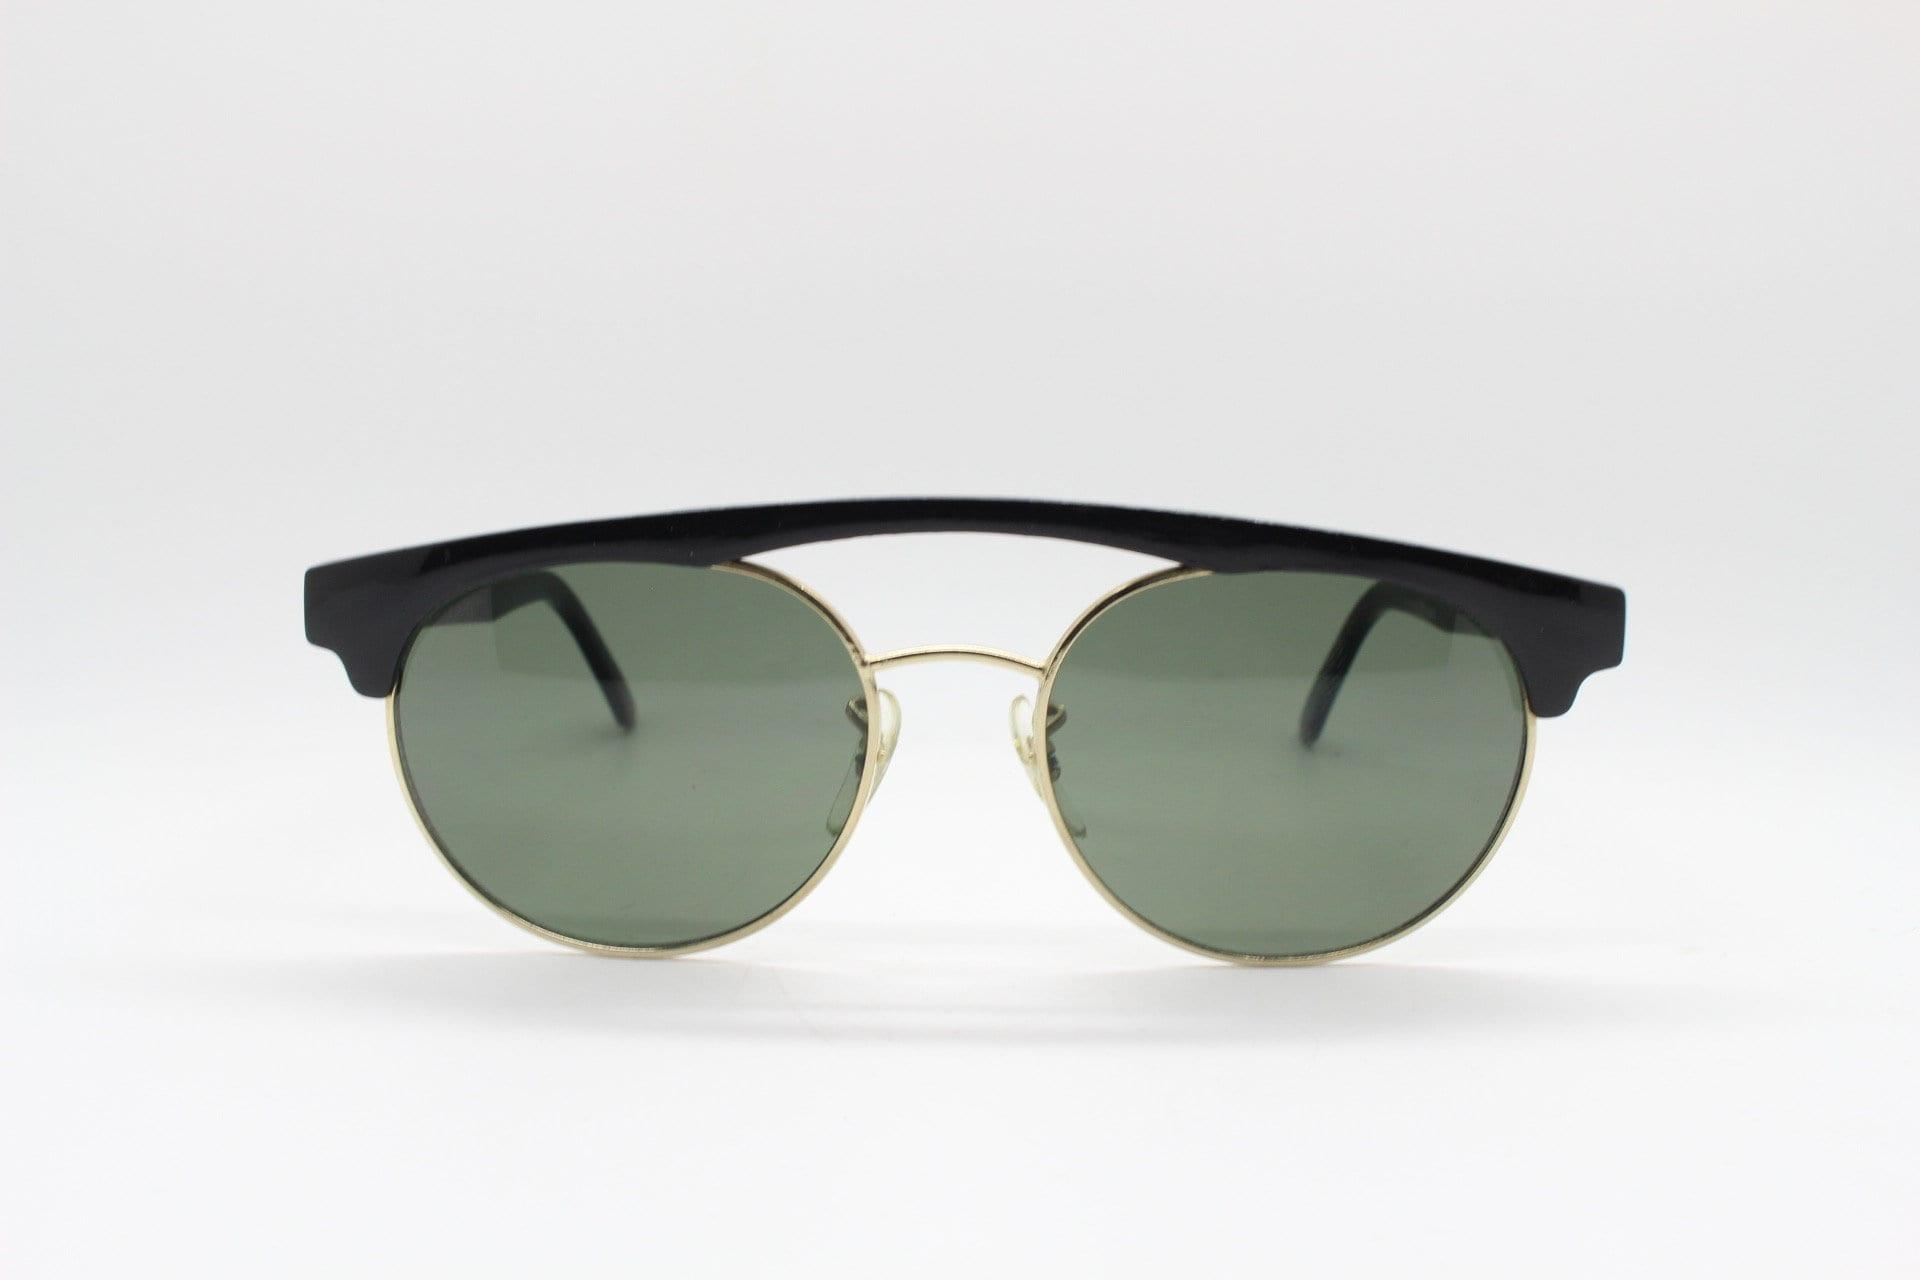 Dynamic honey tortoise brow line double bridge half frame Luxe Gallery Projects Linda Farrow 80s vintage sunglasses model 218